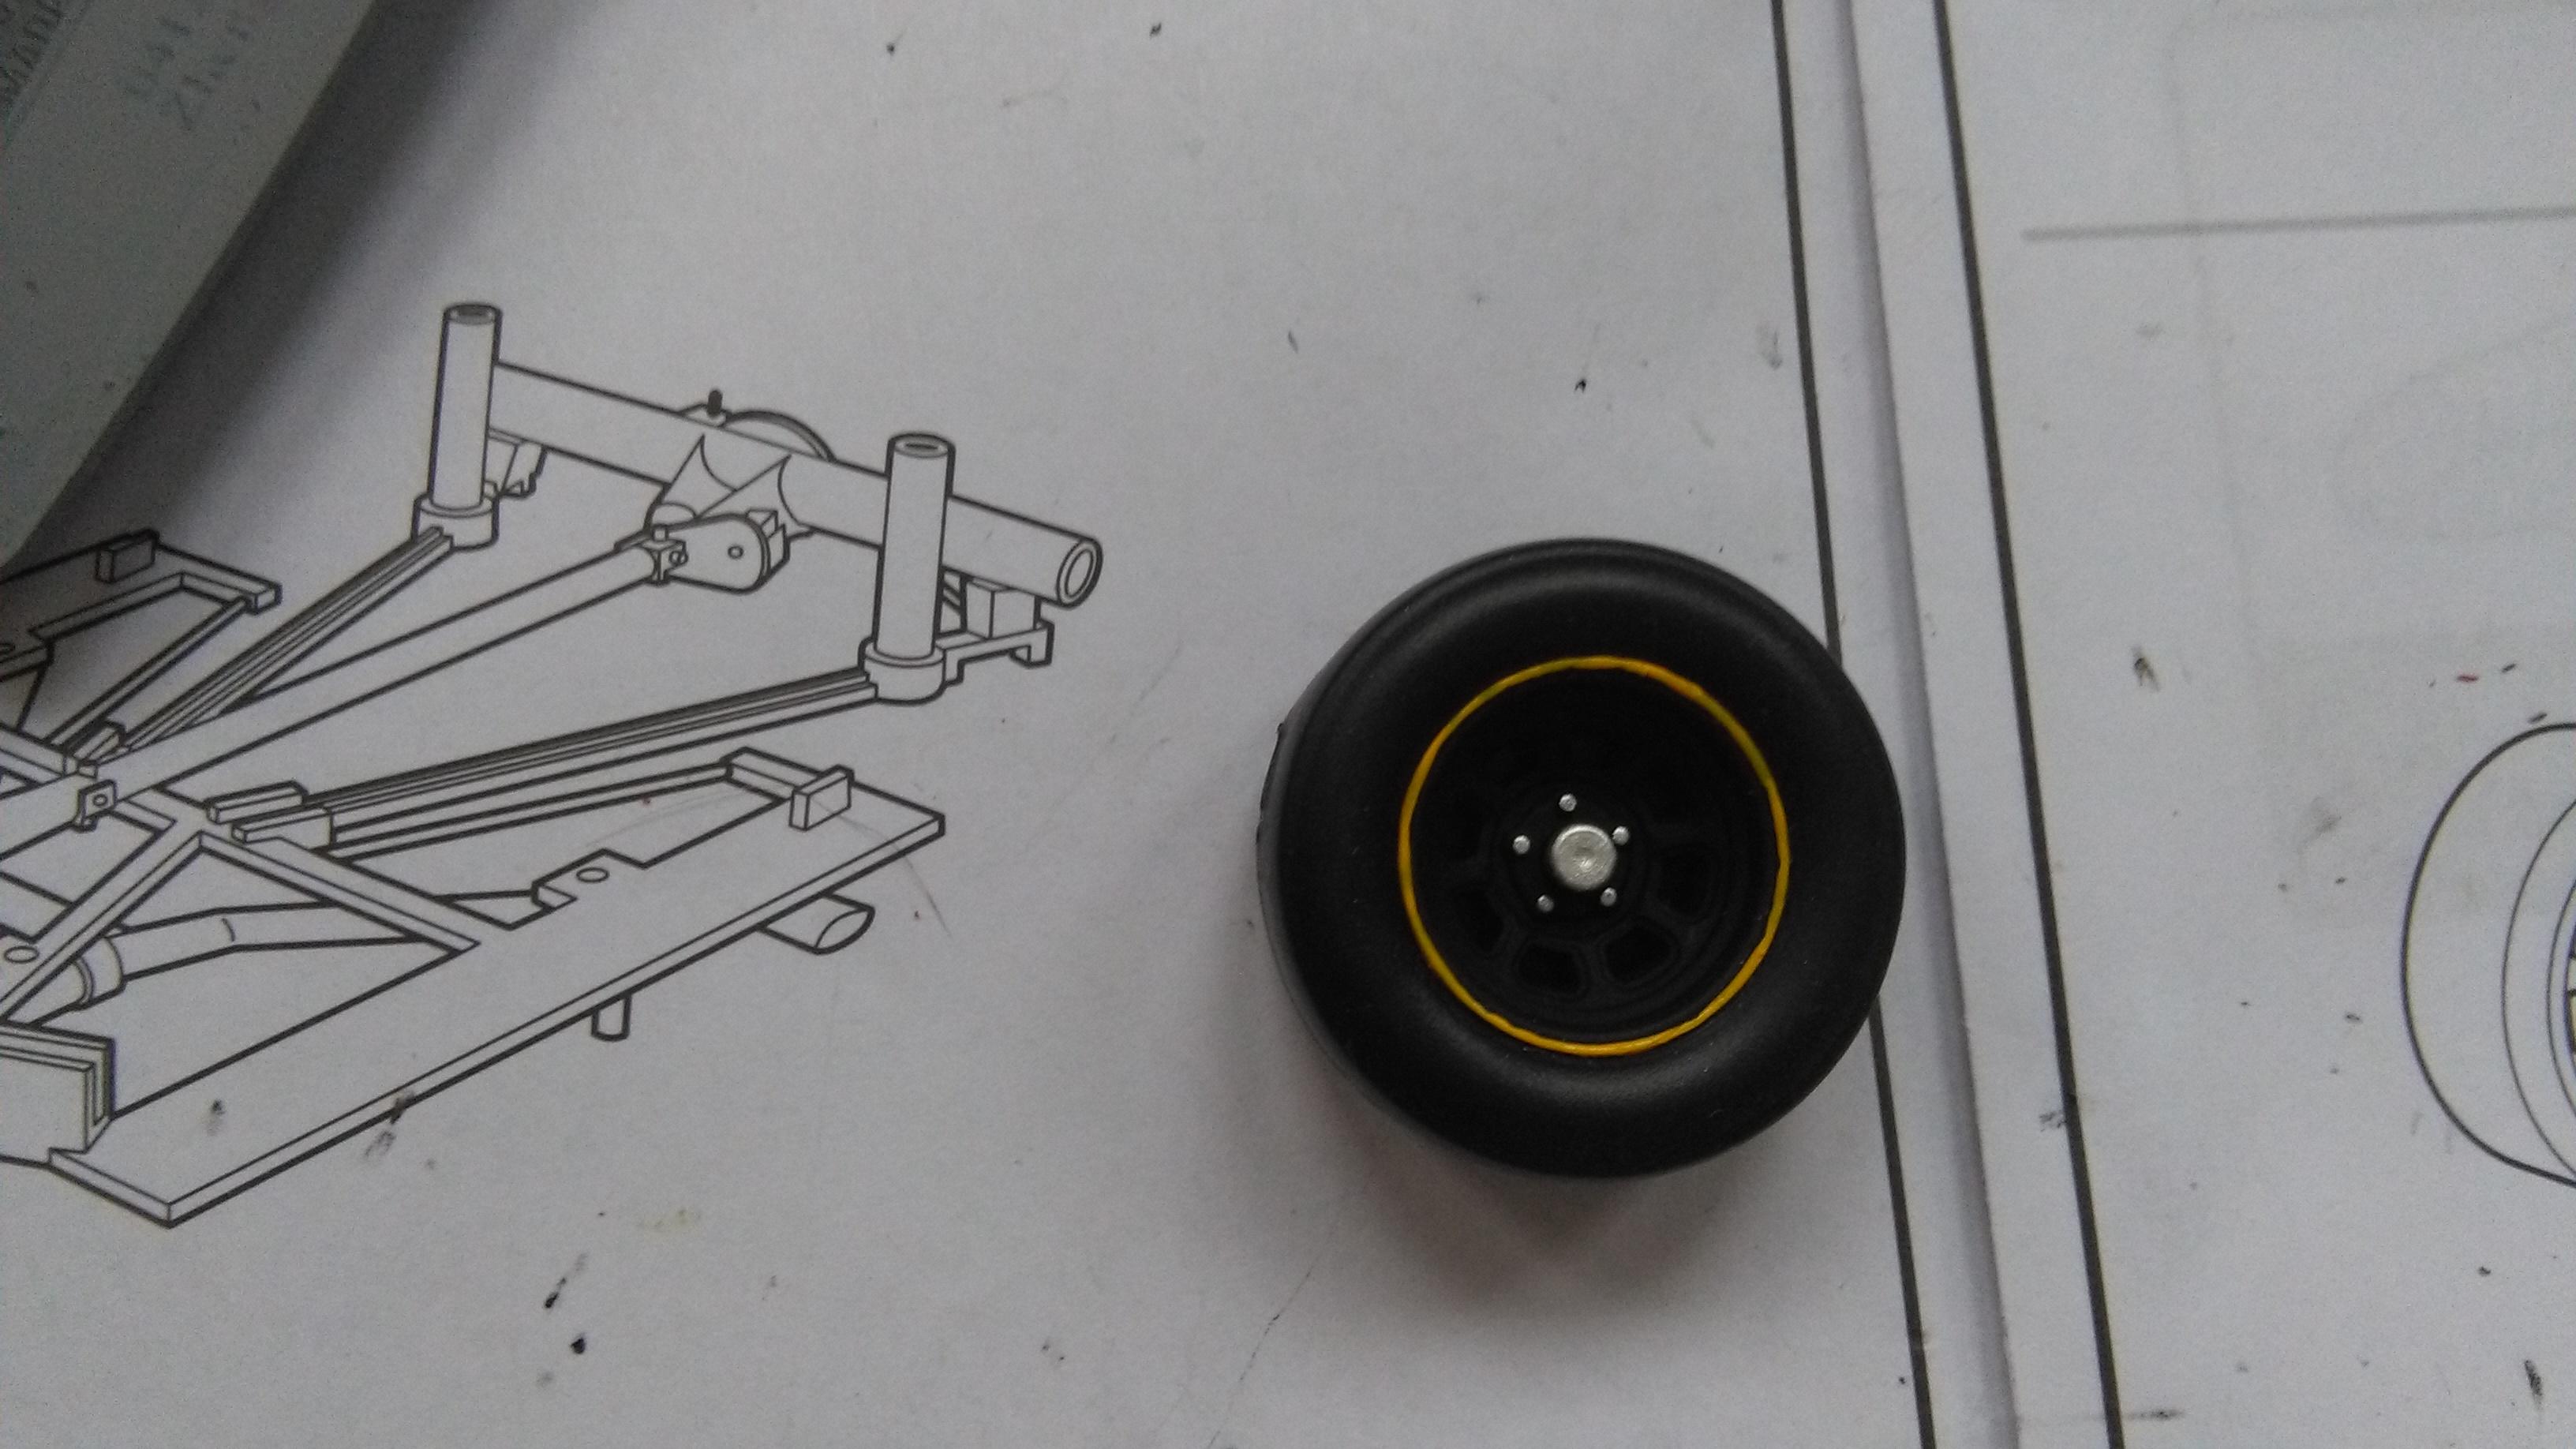 Chevrolet SS 2015 #24 Jeff Gordon 3M 663136IMG20170319165448